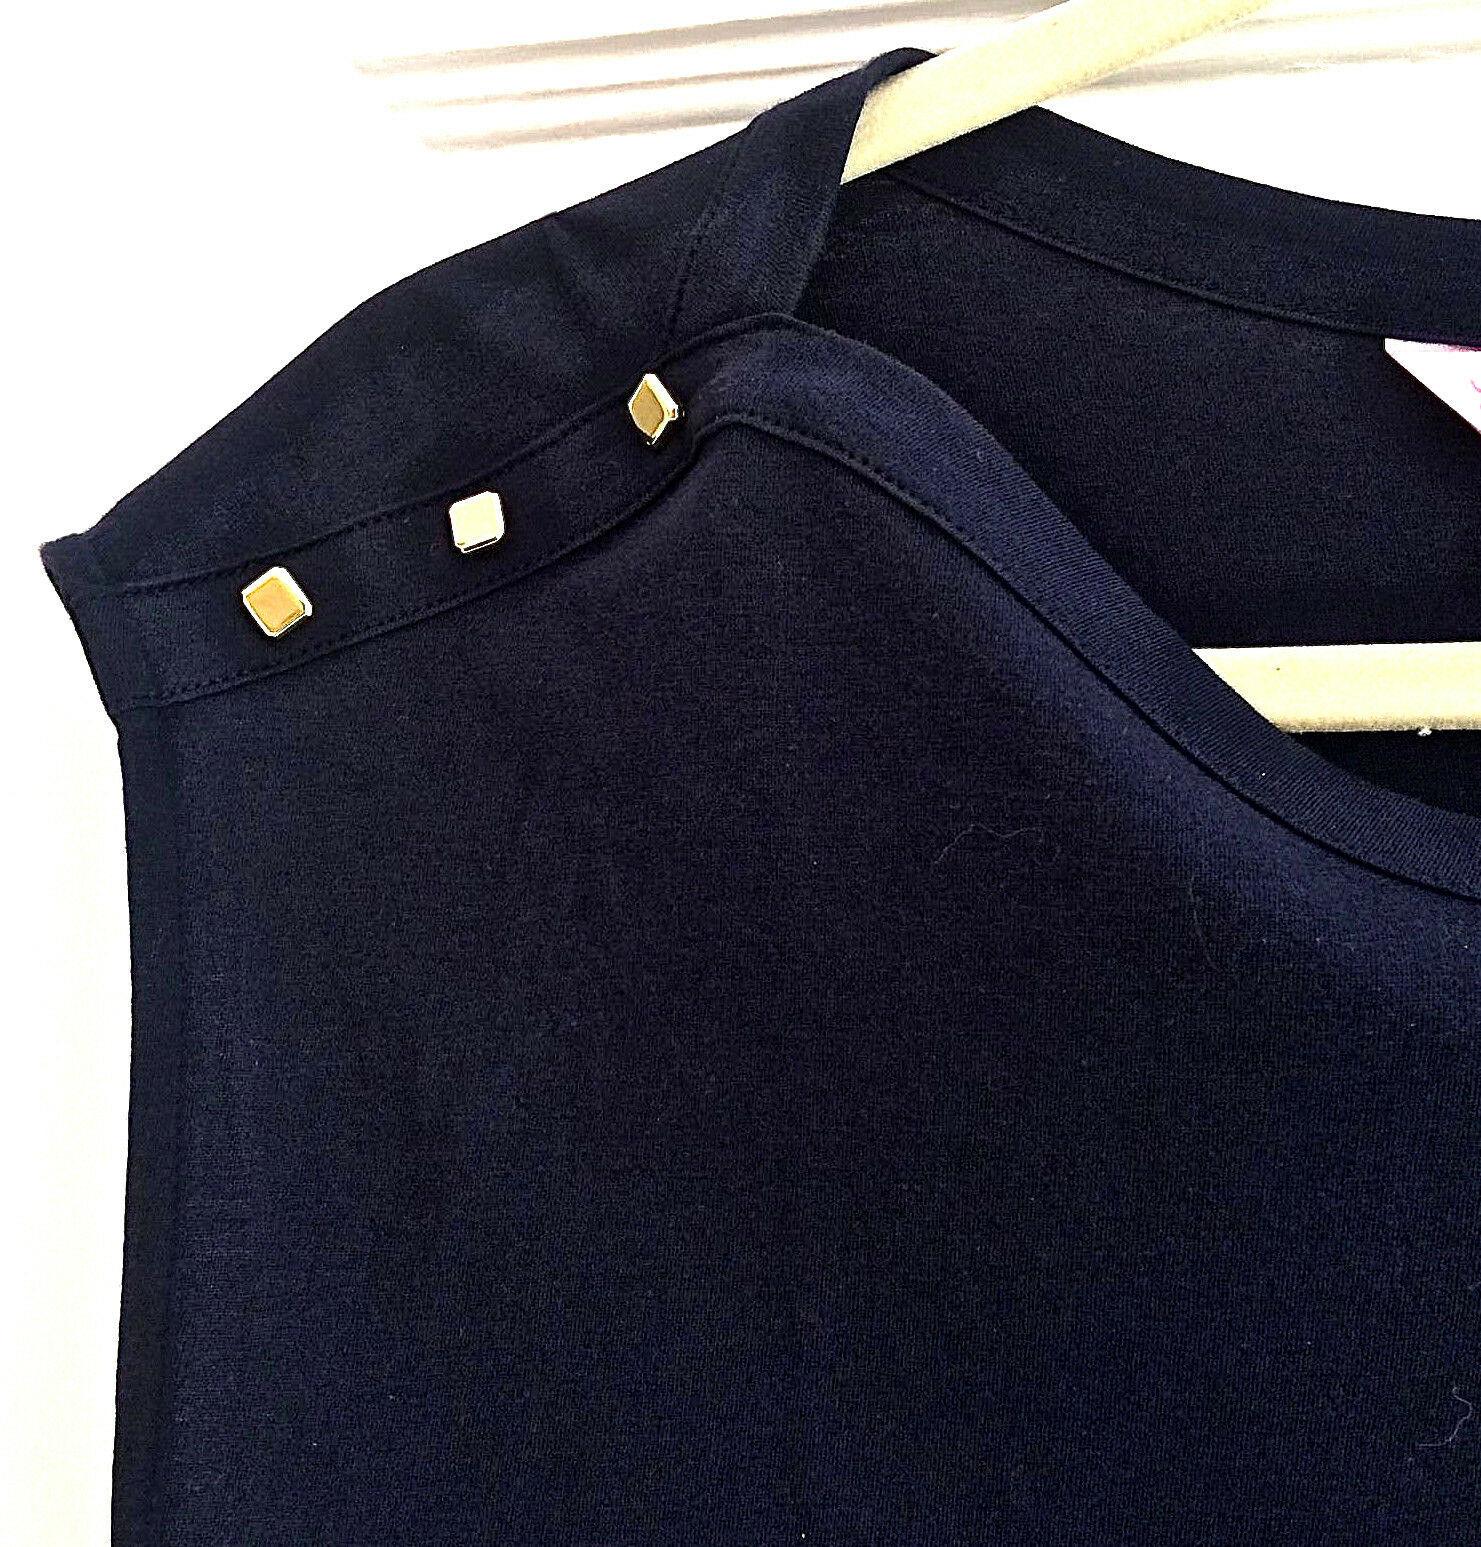 Lilly Pulitzer Sz M Robyn Sleeveless Shift Dress True Navy 6 Gold Buttons EUC image 10